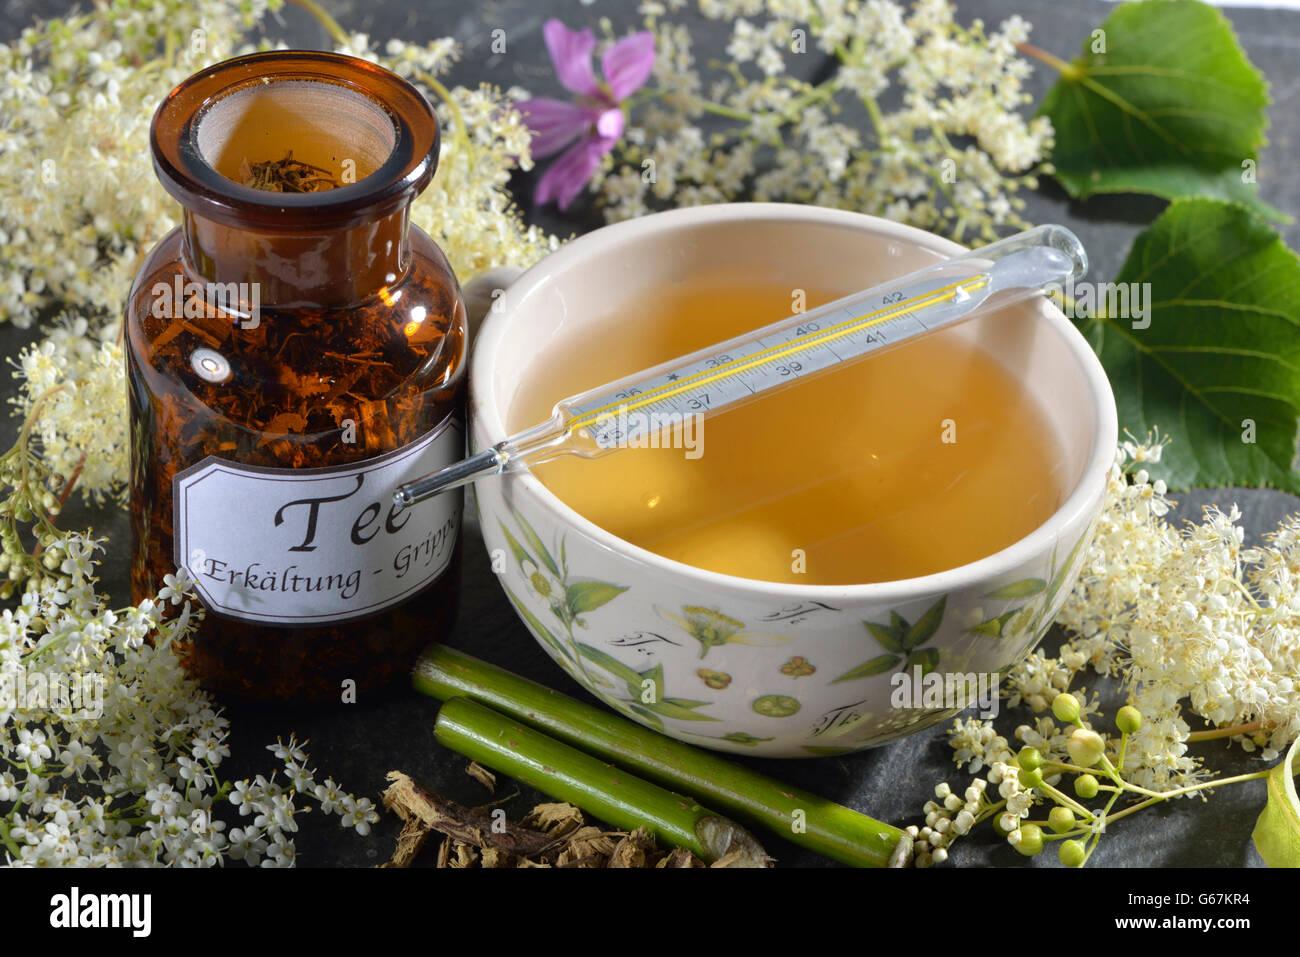 Colds and Influenza tea, Lime Tree blossom, Elderflower, Elderberry, Mallow leaf, Mallow, Common Mallow, Liquorice - Stock Image